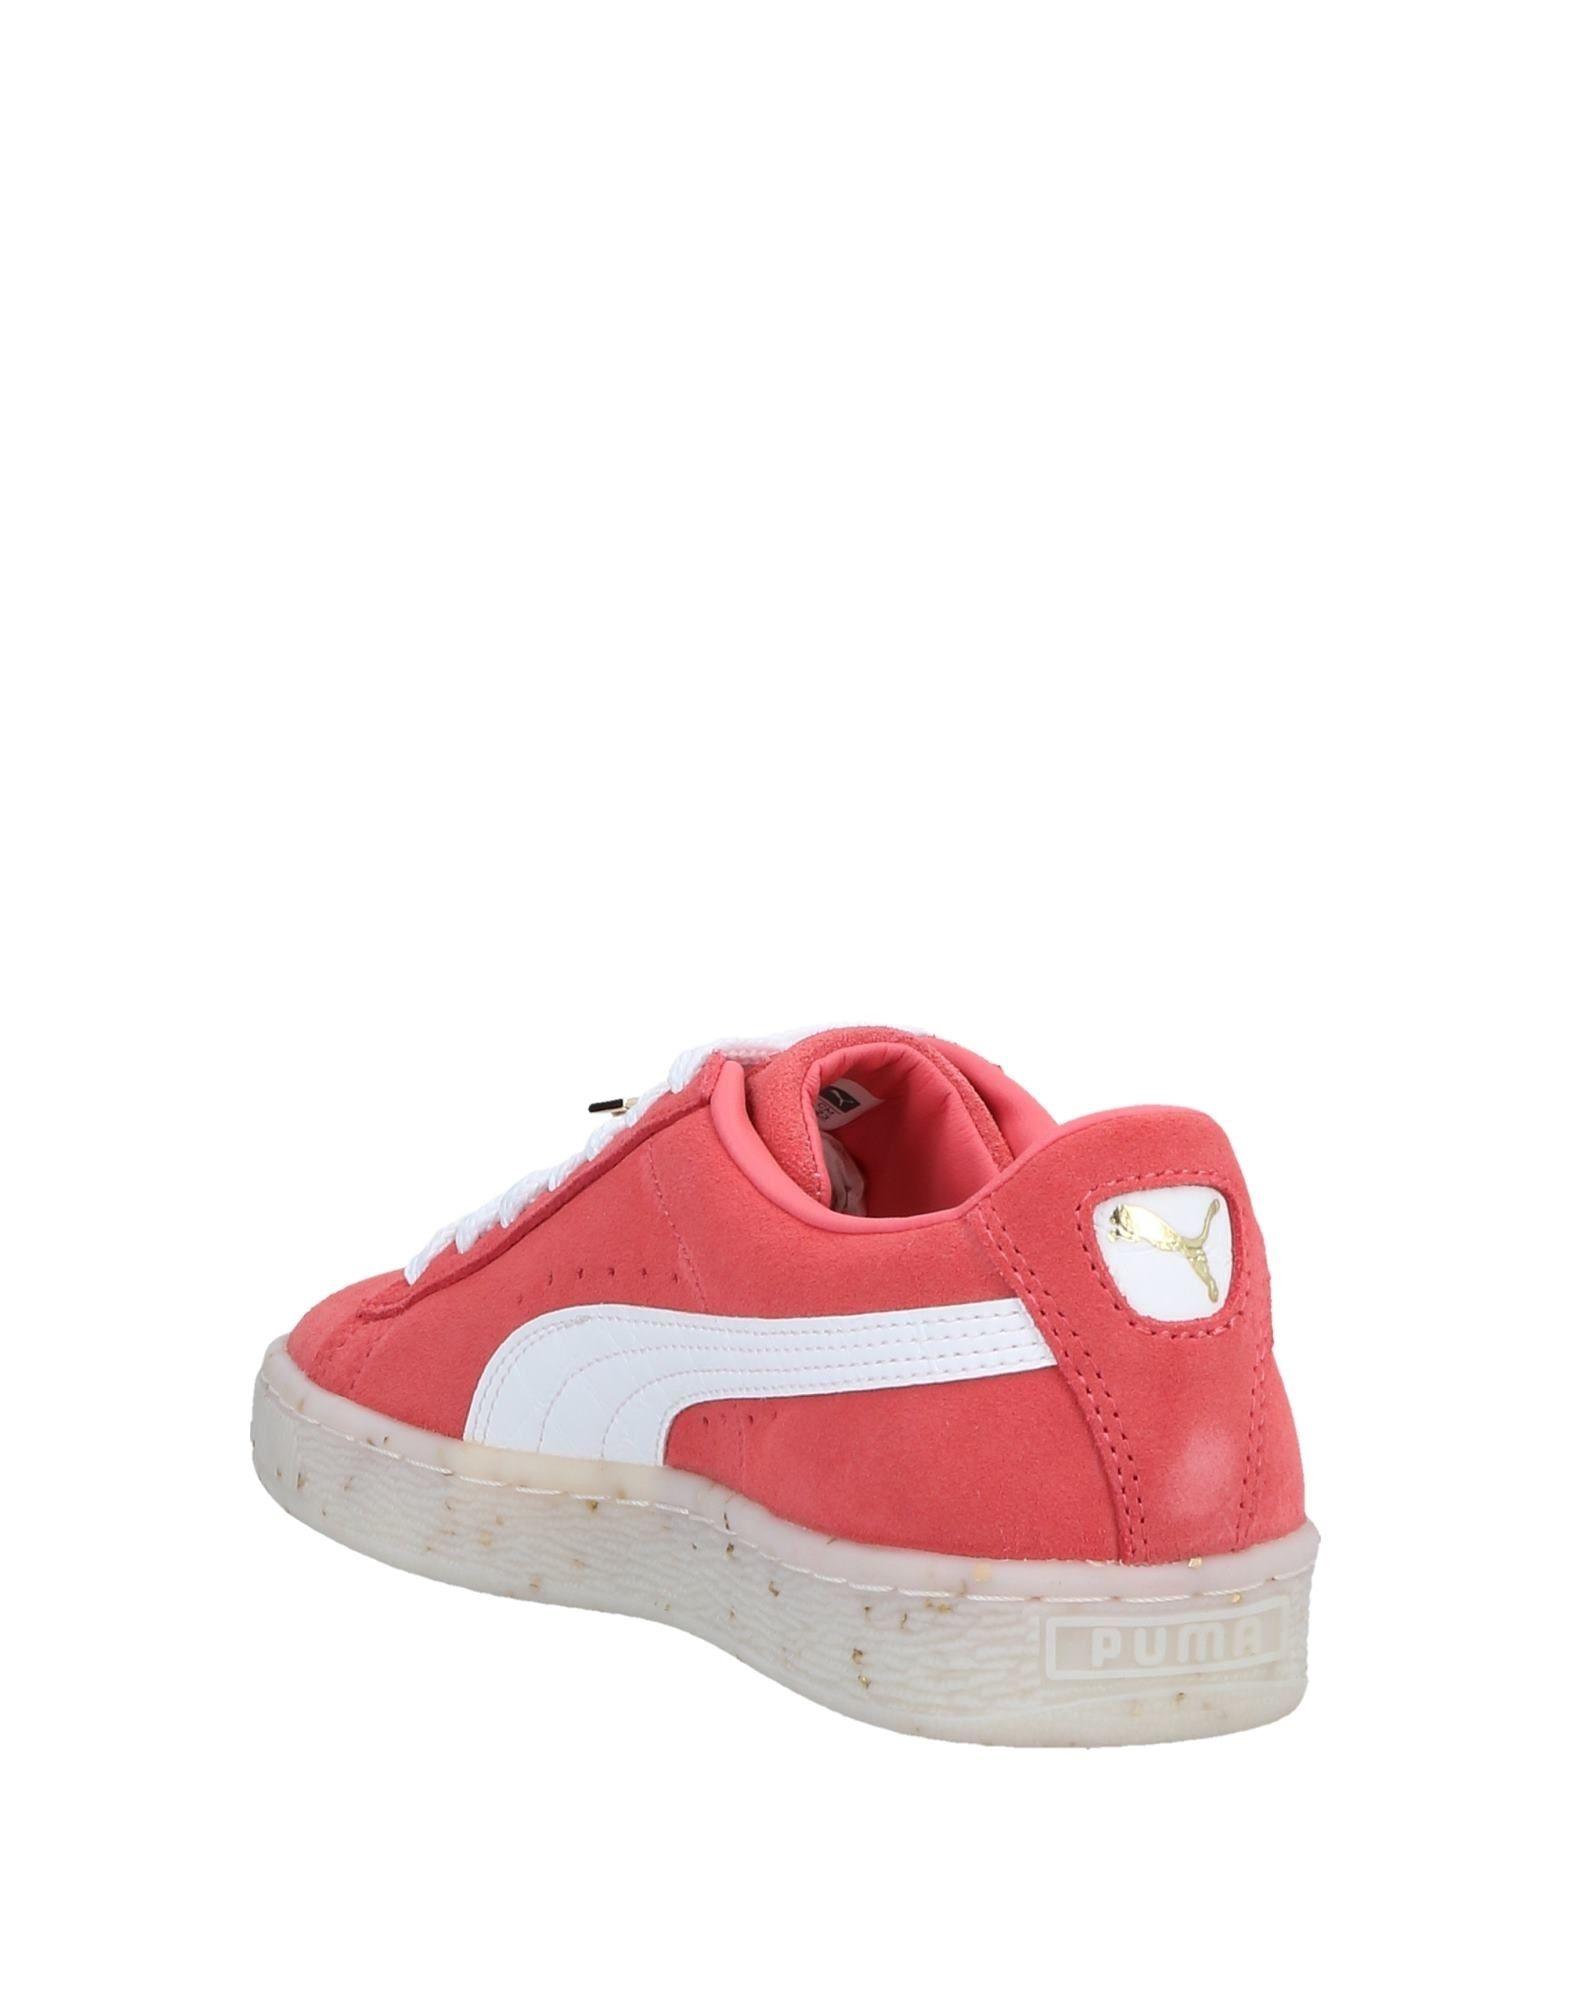 Puma 11559238ID Sneakers Damen  11559238ID Puma Gute Qualität beliebte Schuhe ddb044